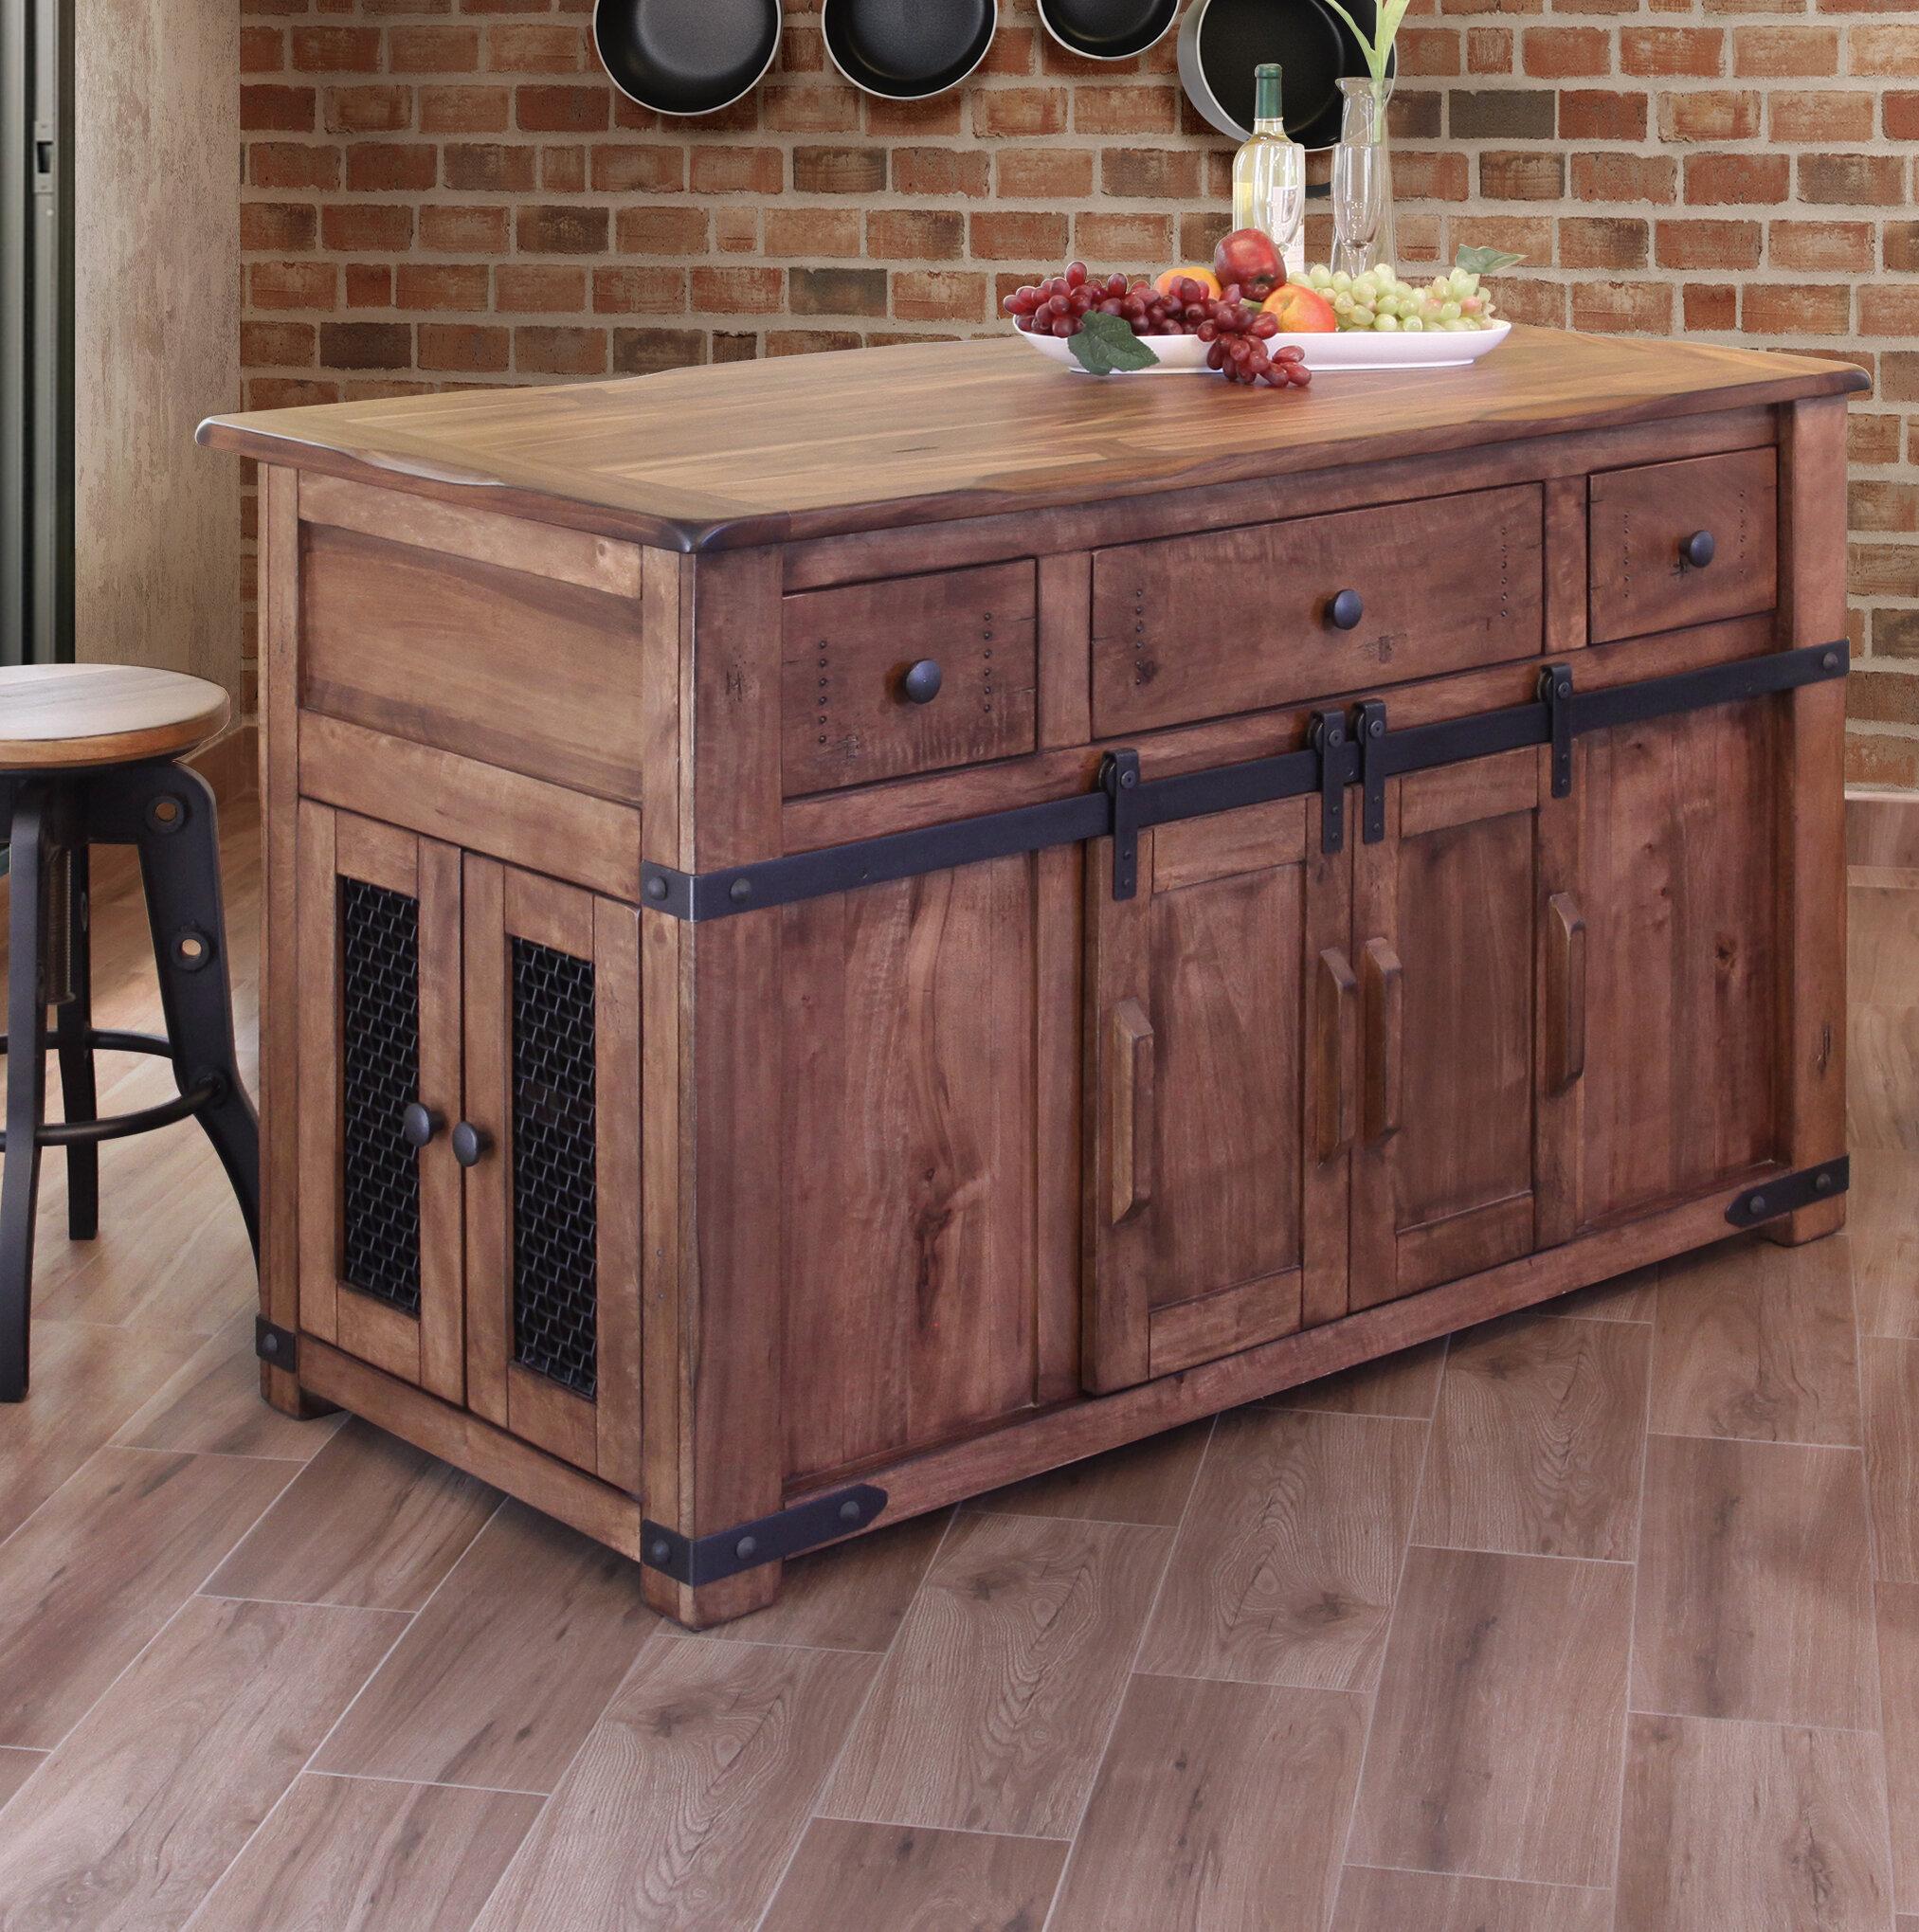 Assembled Medium Kitchen Islands & Carts You